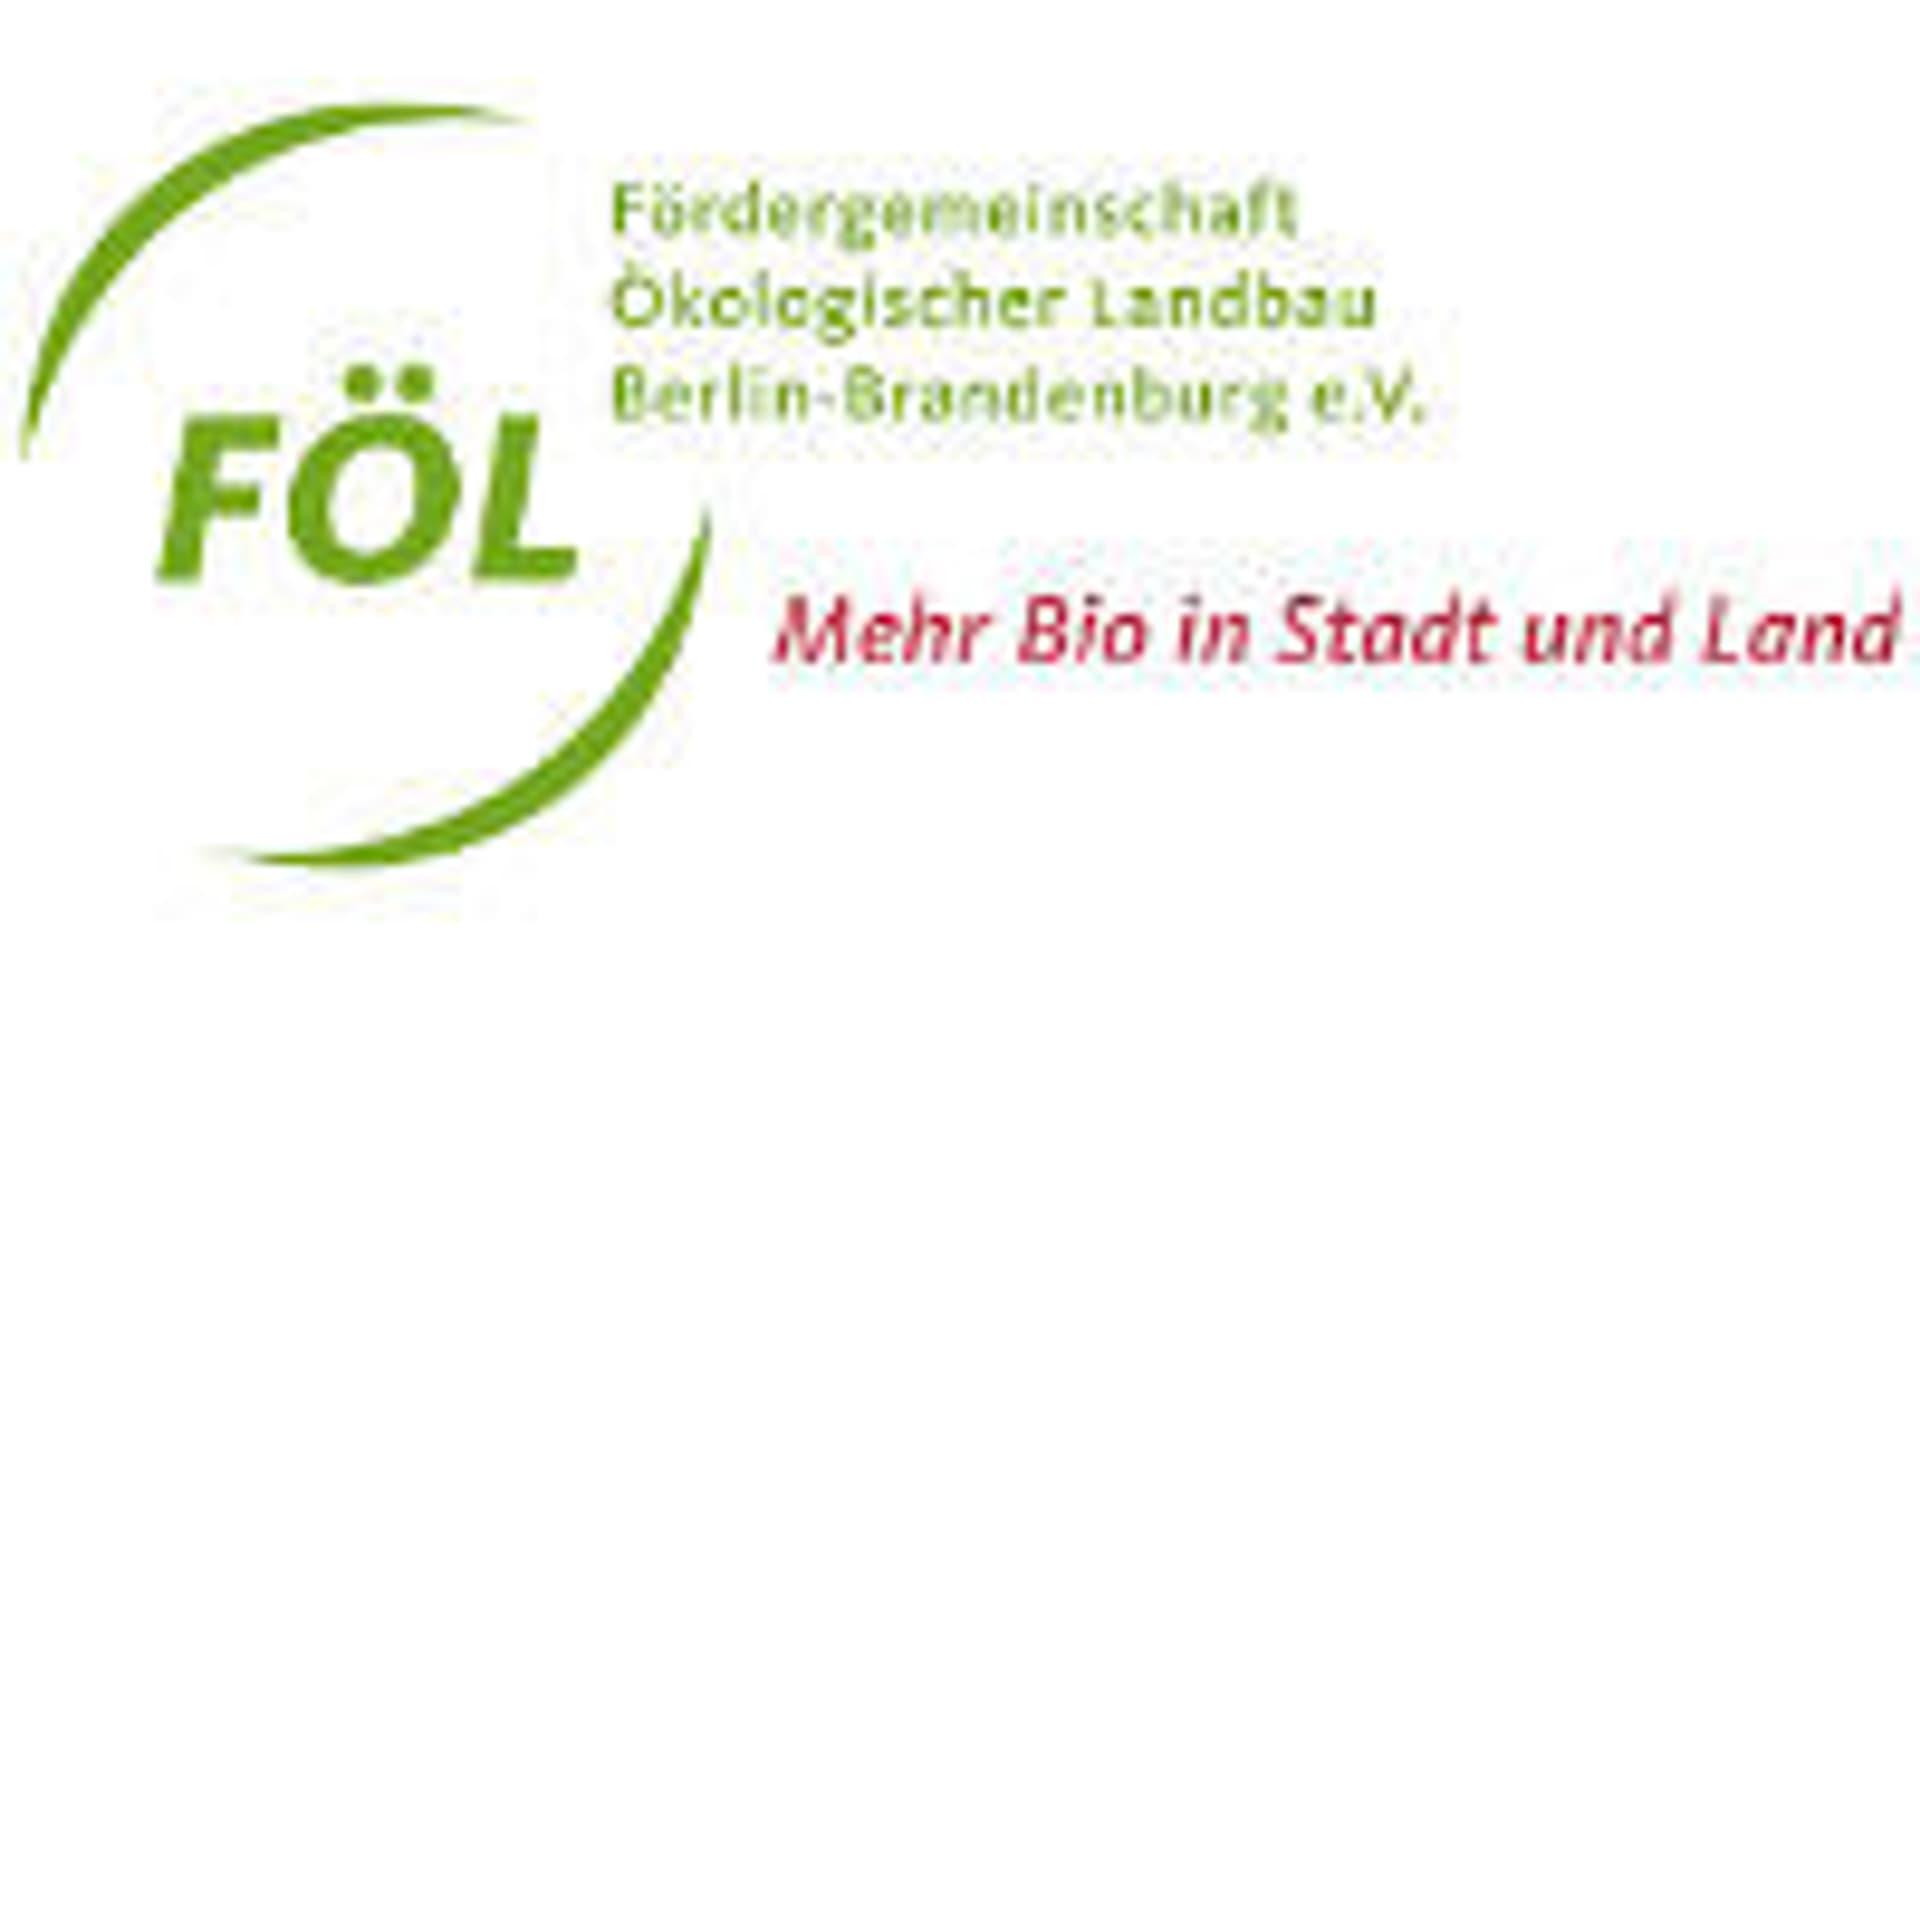 FOEL Berlin Brandenburg